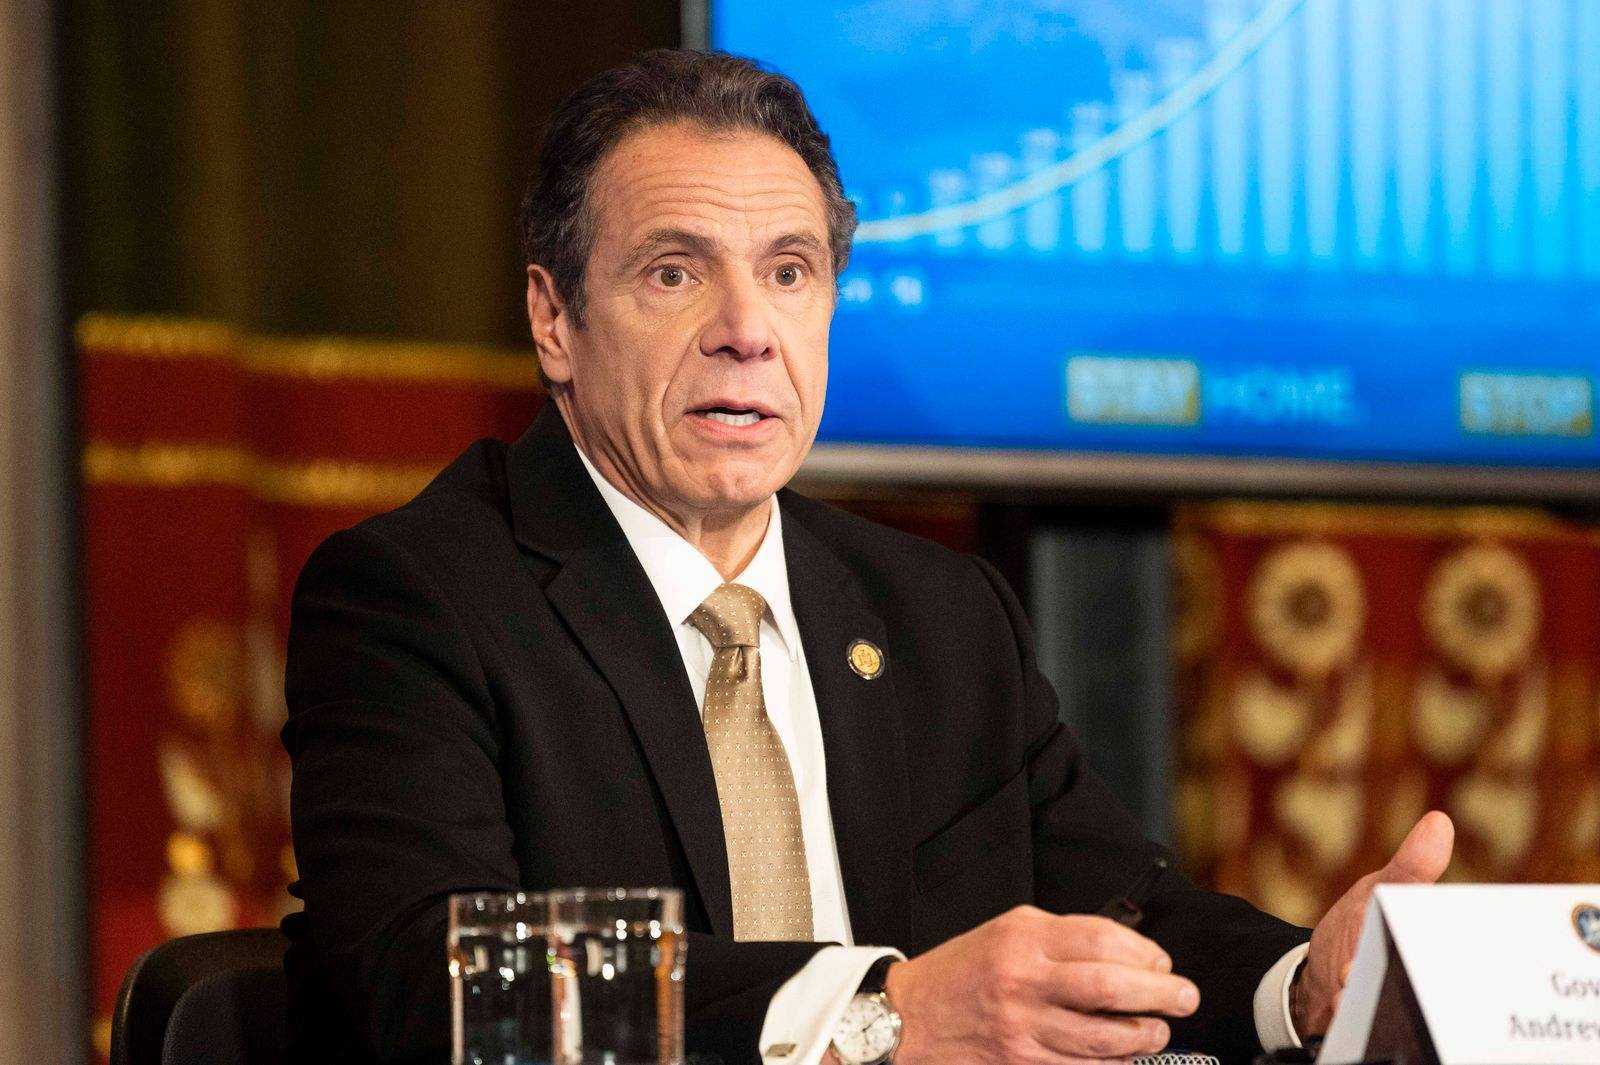 April 22, 2020, Albany, NY, U.S: April 22, 2020 - Albany, NY, United States: New York Governor ANDREW CUOMO (D) speaking